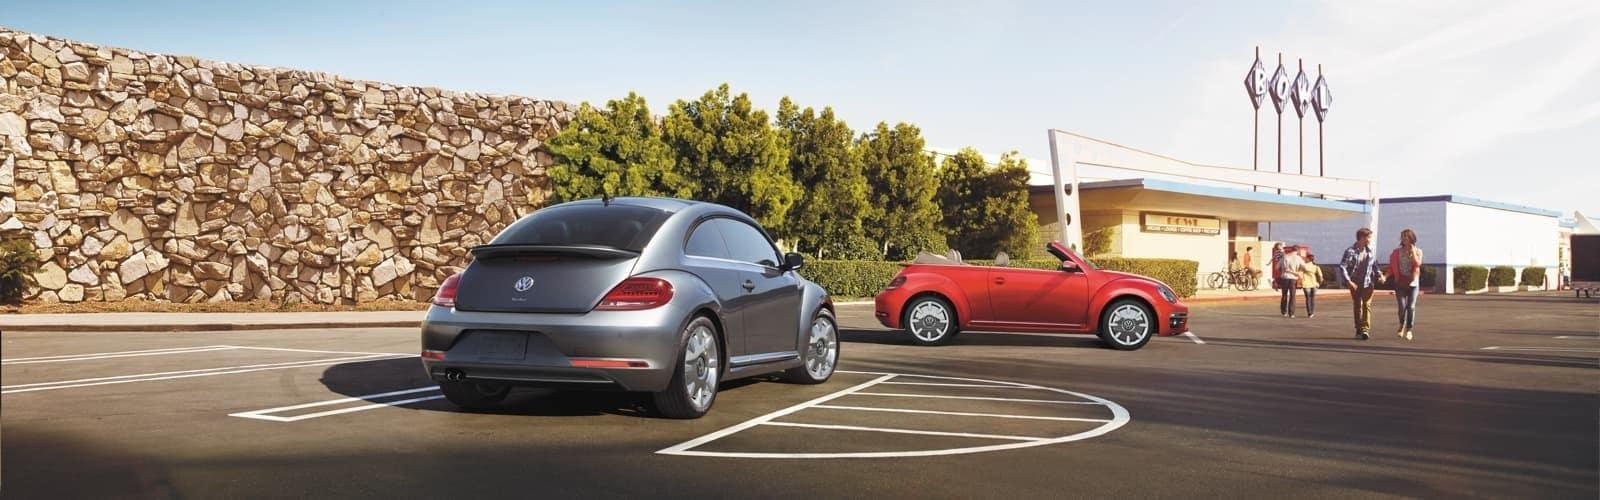 Volkswagen Beetles sitting in a parking lot